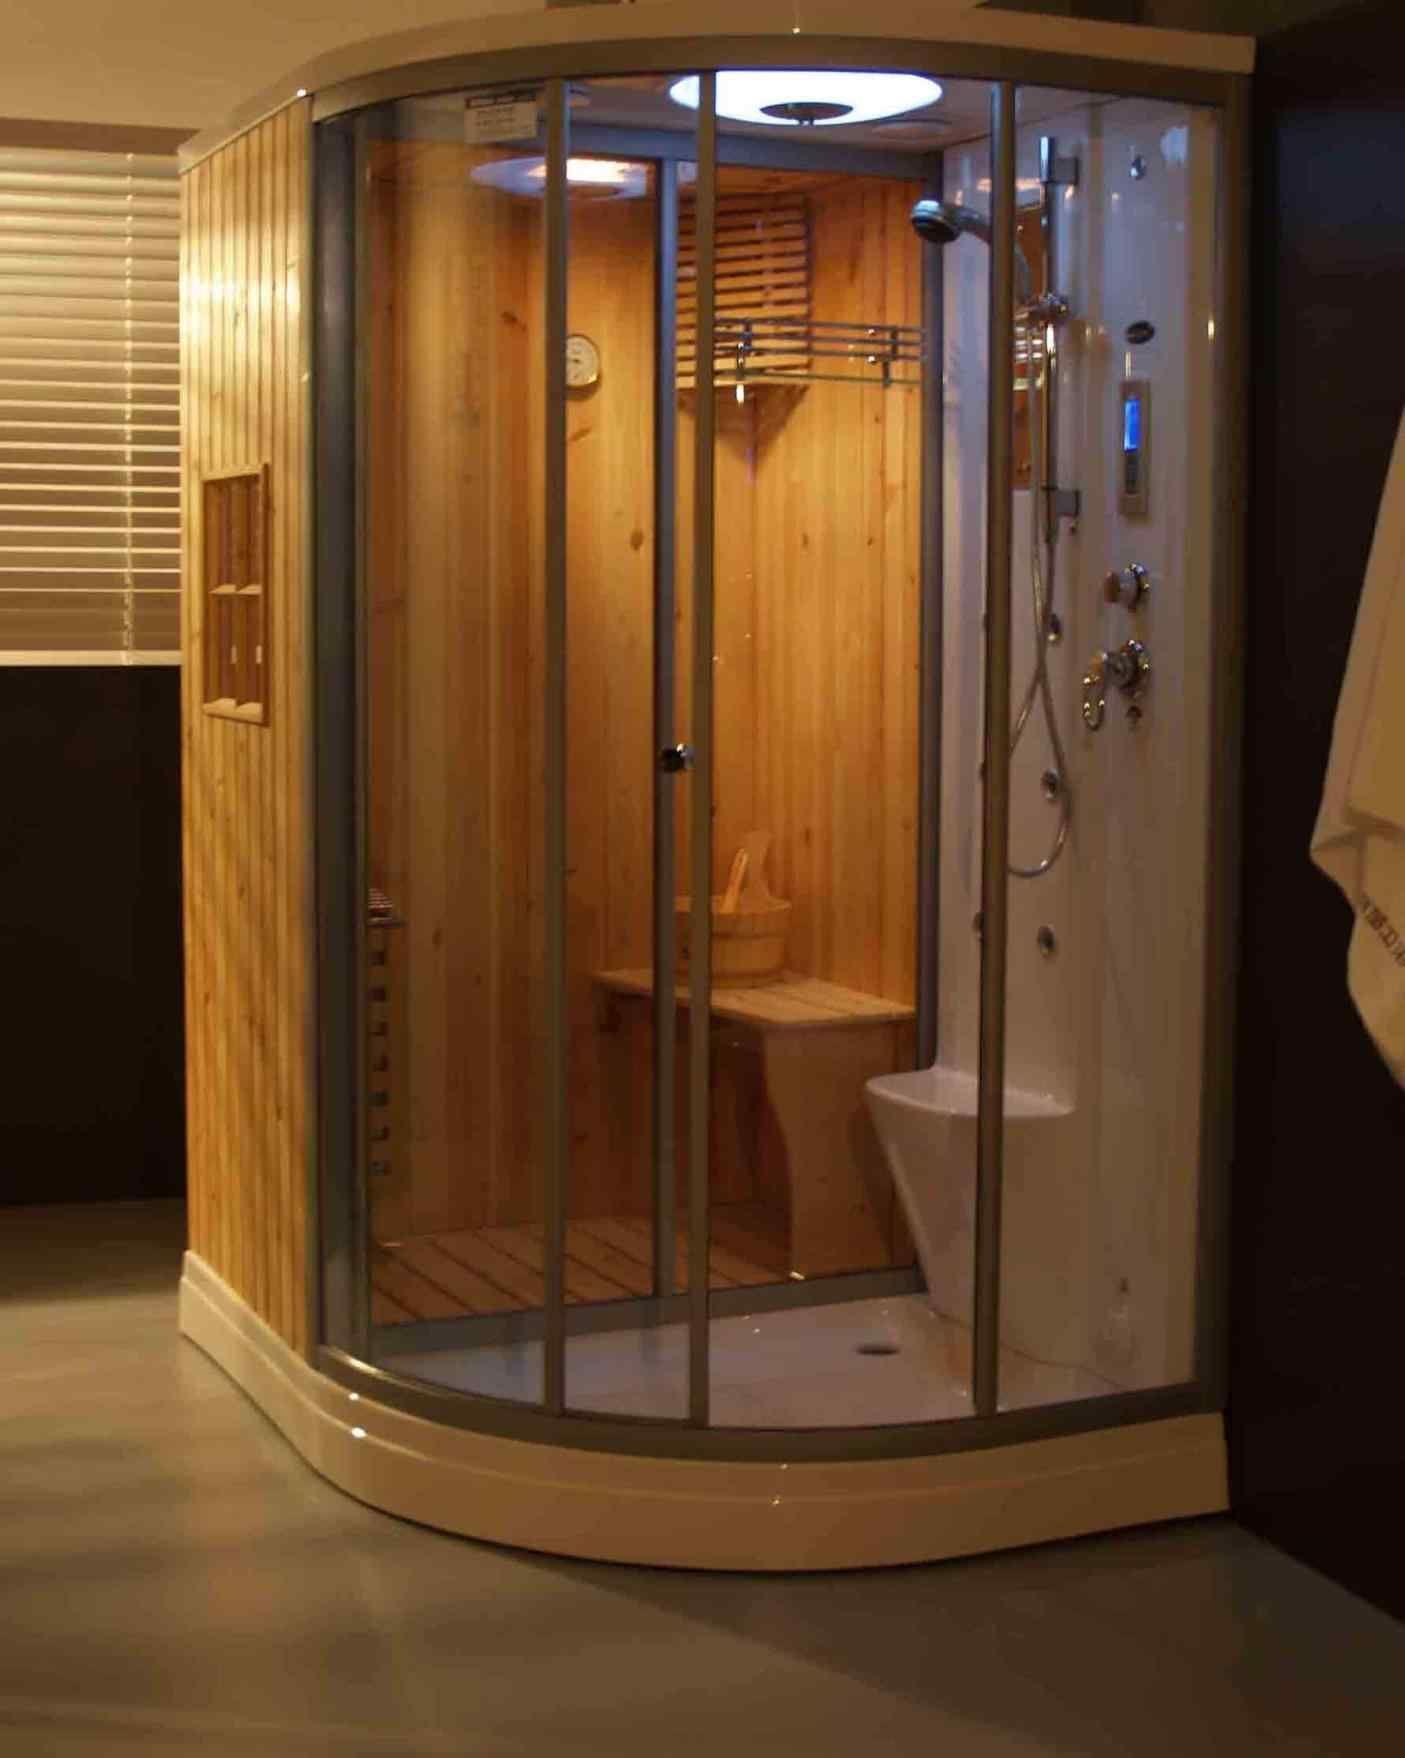 11 top and adorable steam room bathroom designs ideas interior rh pinterest com Steam Rooms Small Bathroom Home Steam Room